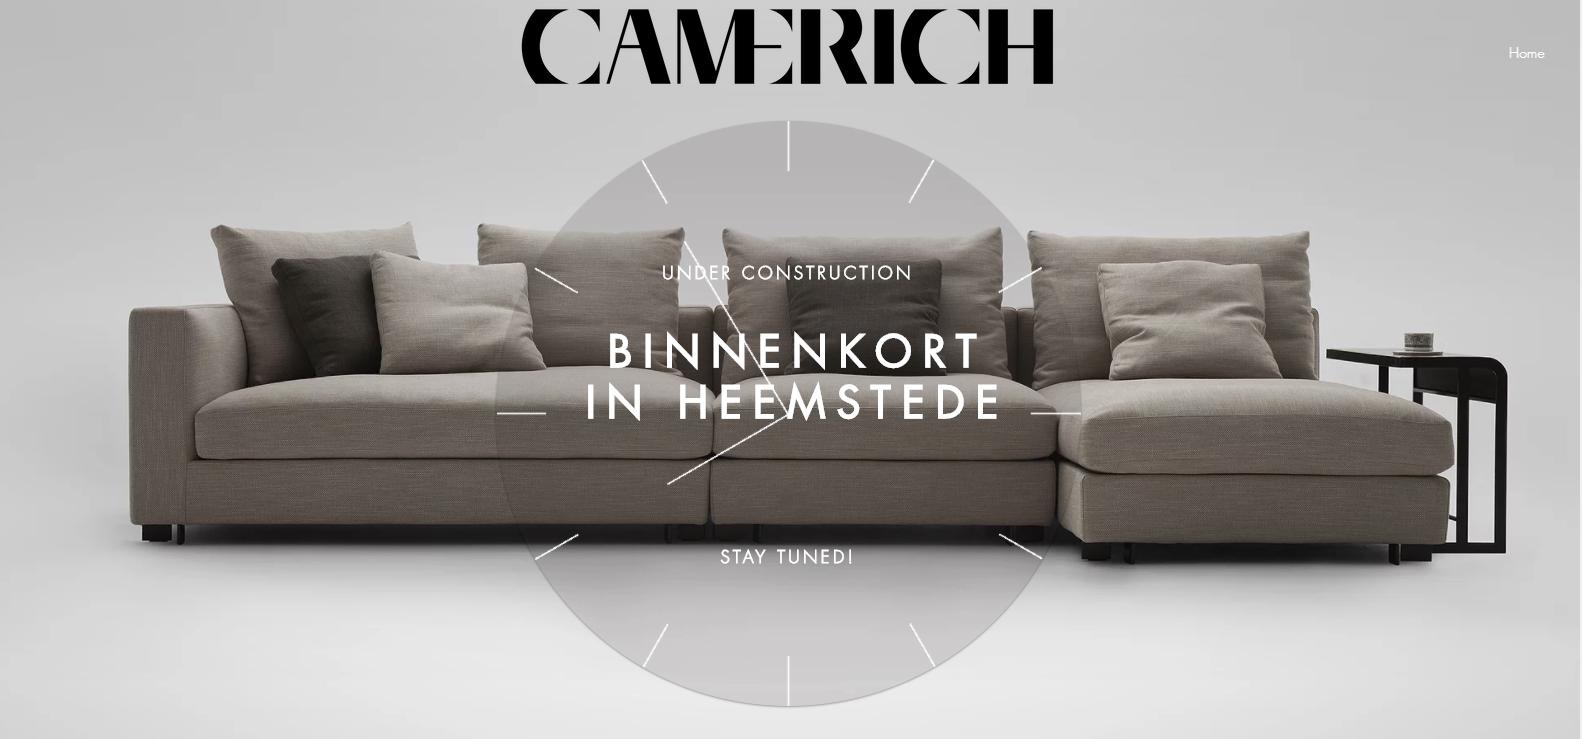 Camerich Heemstede